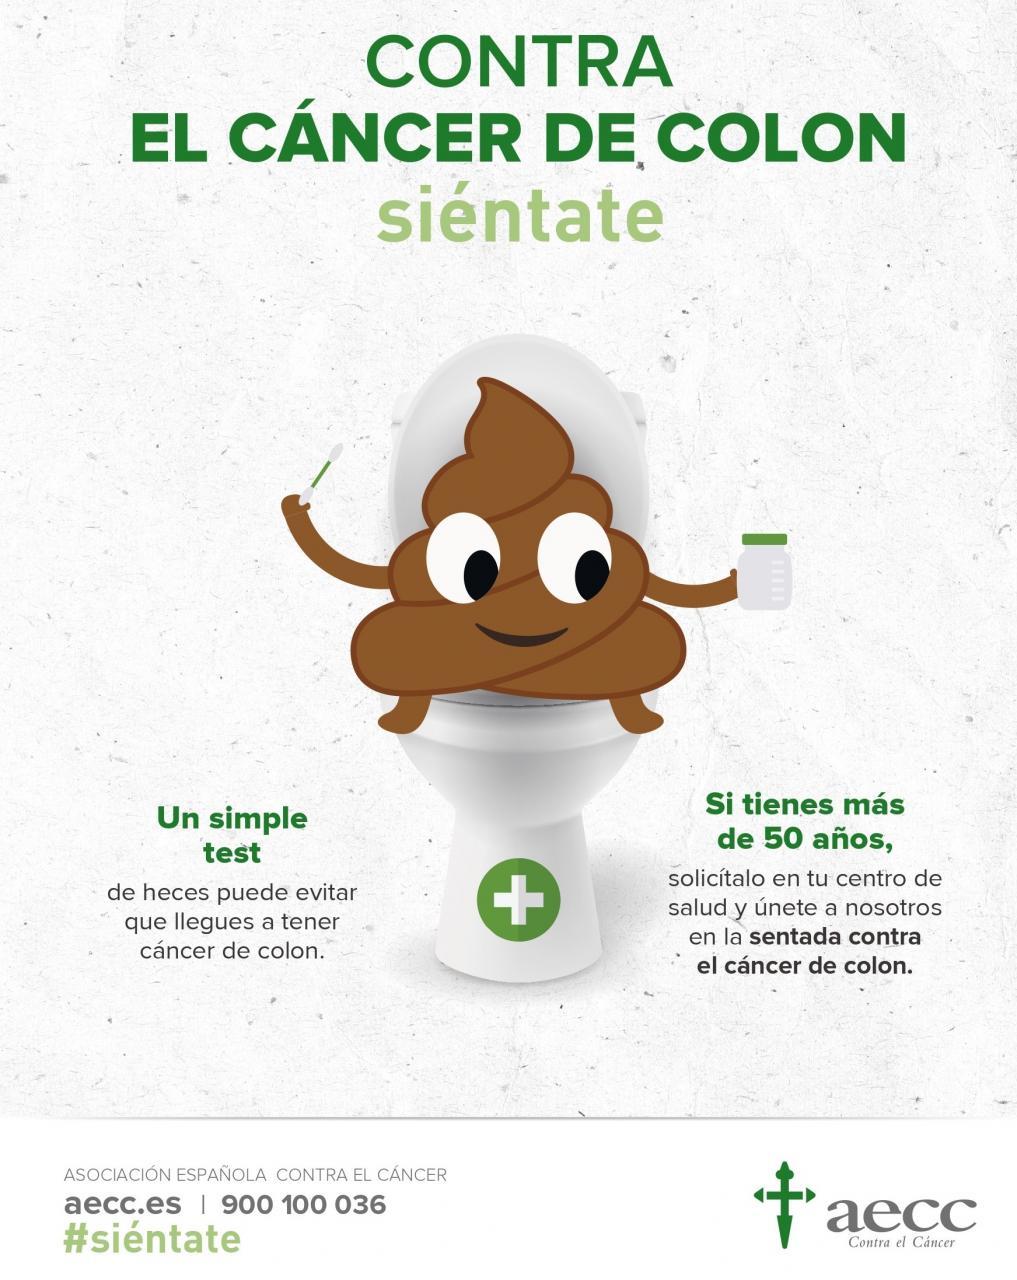 cancer de colon heces sangre cancer la san biopsie